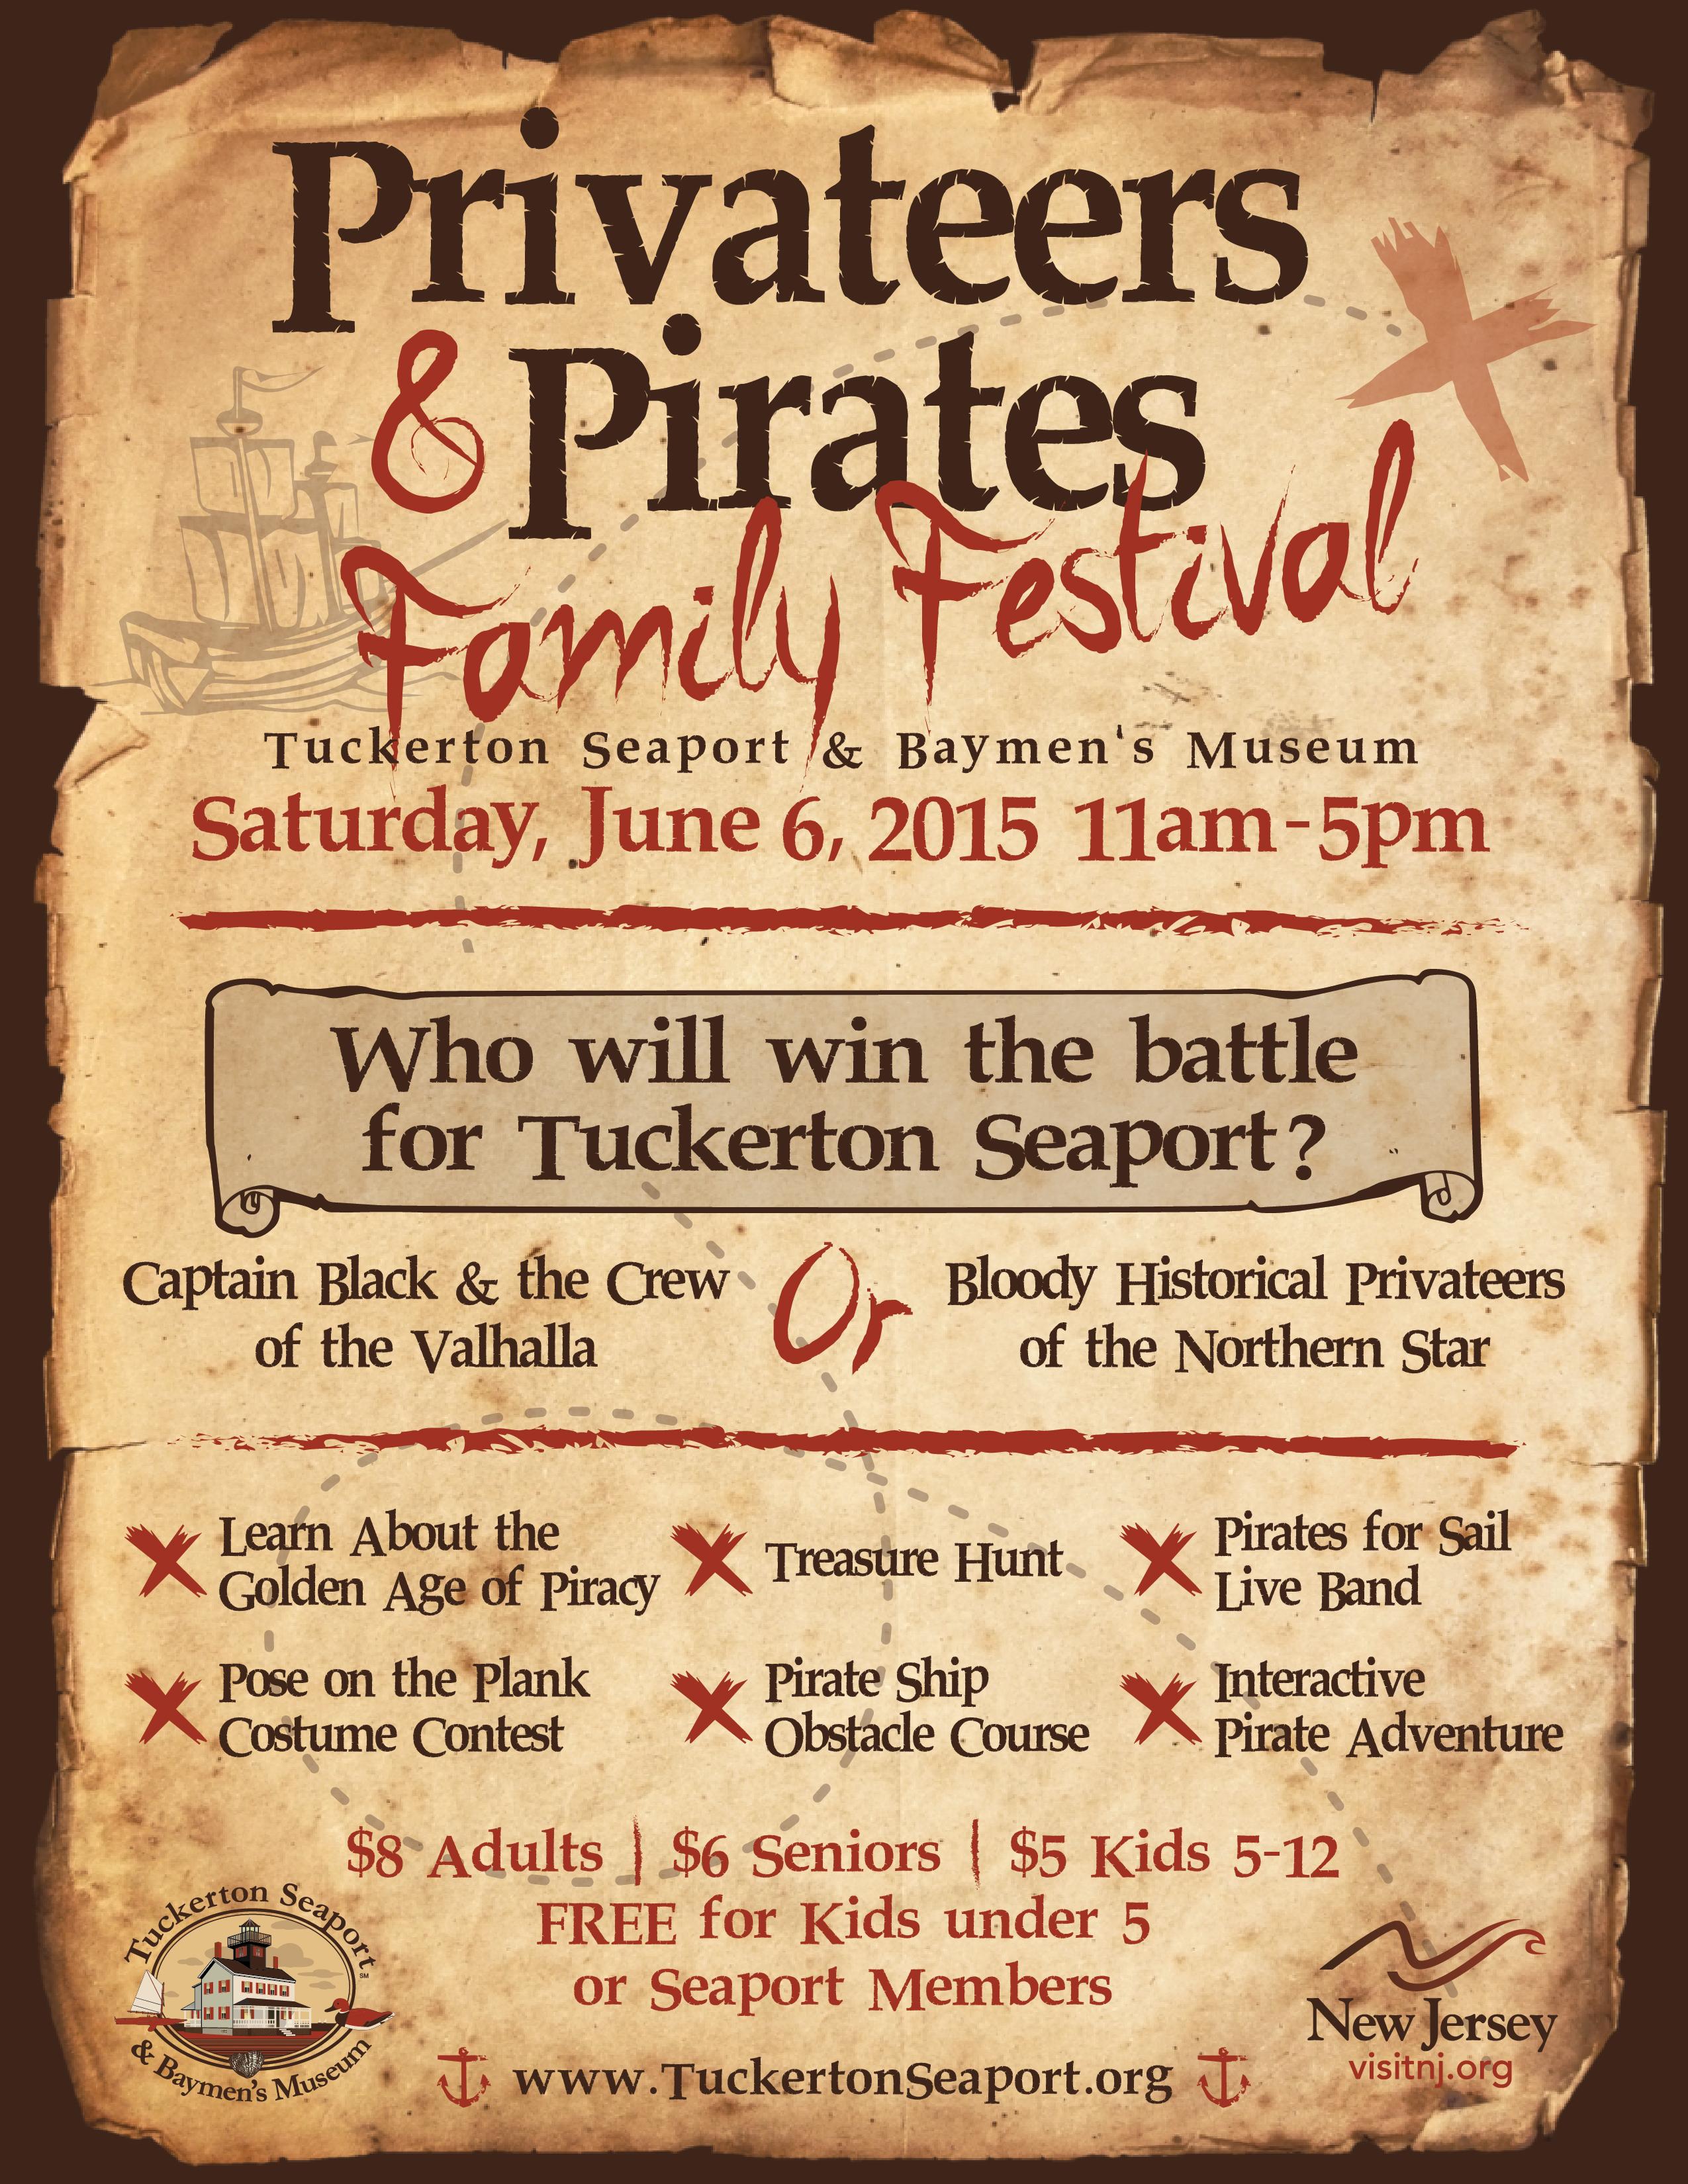 Seaport-Pirates-Festival-2015-Flyer